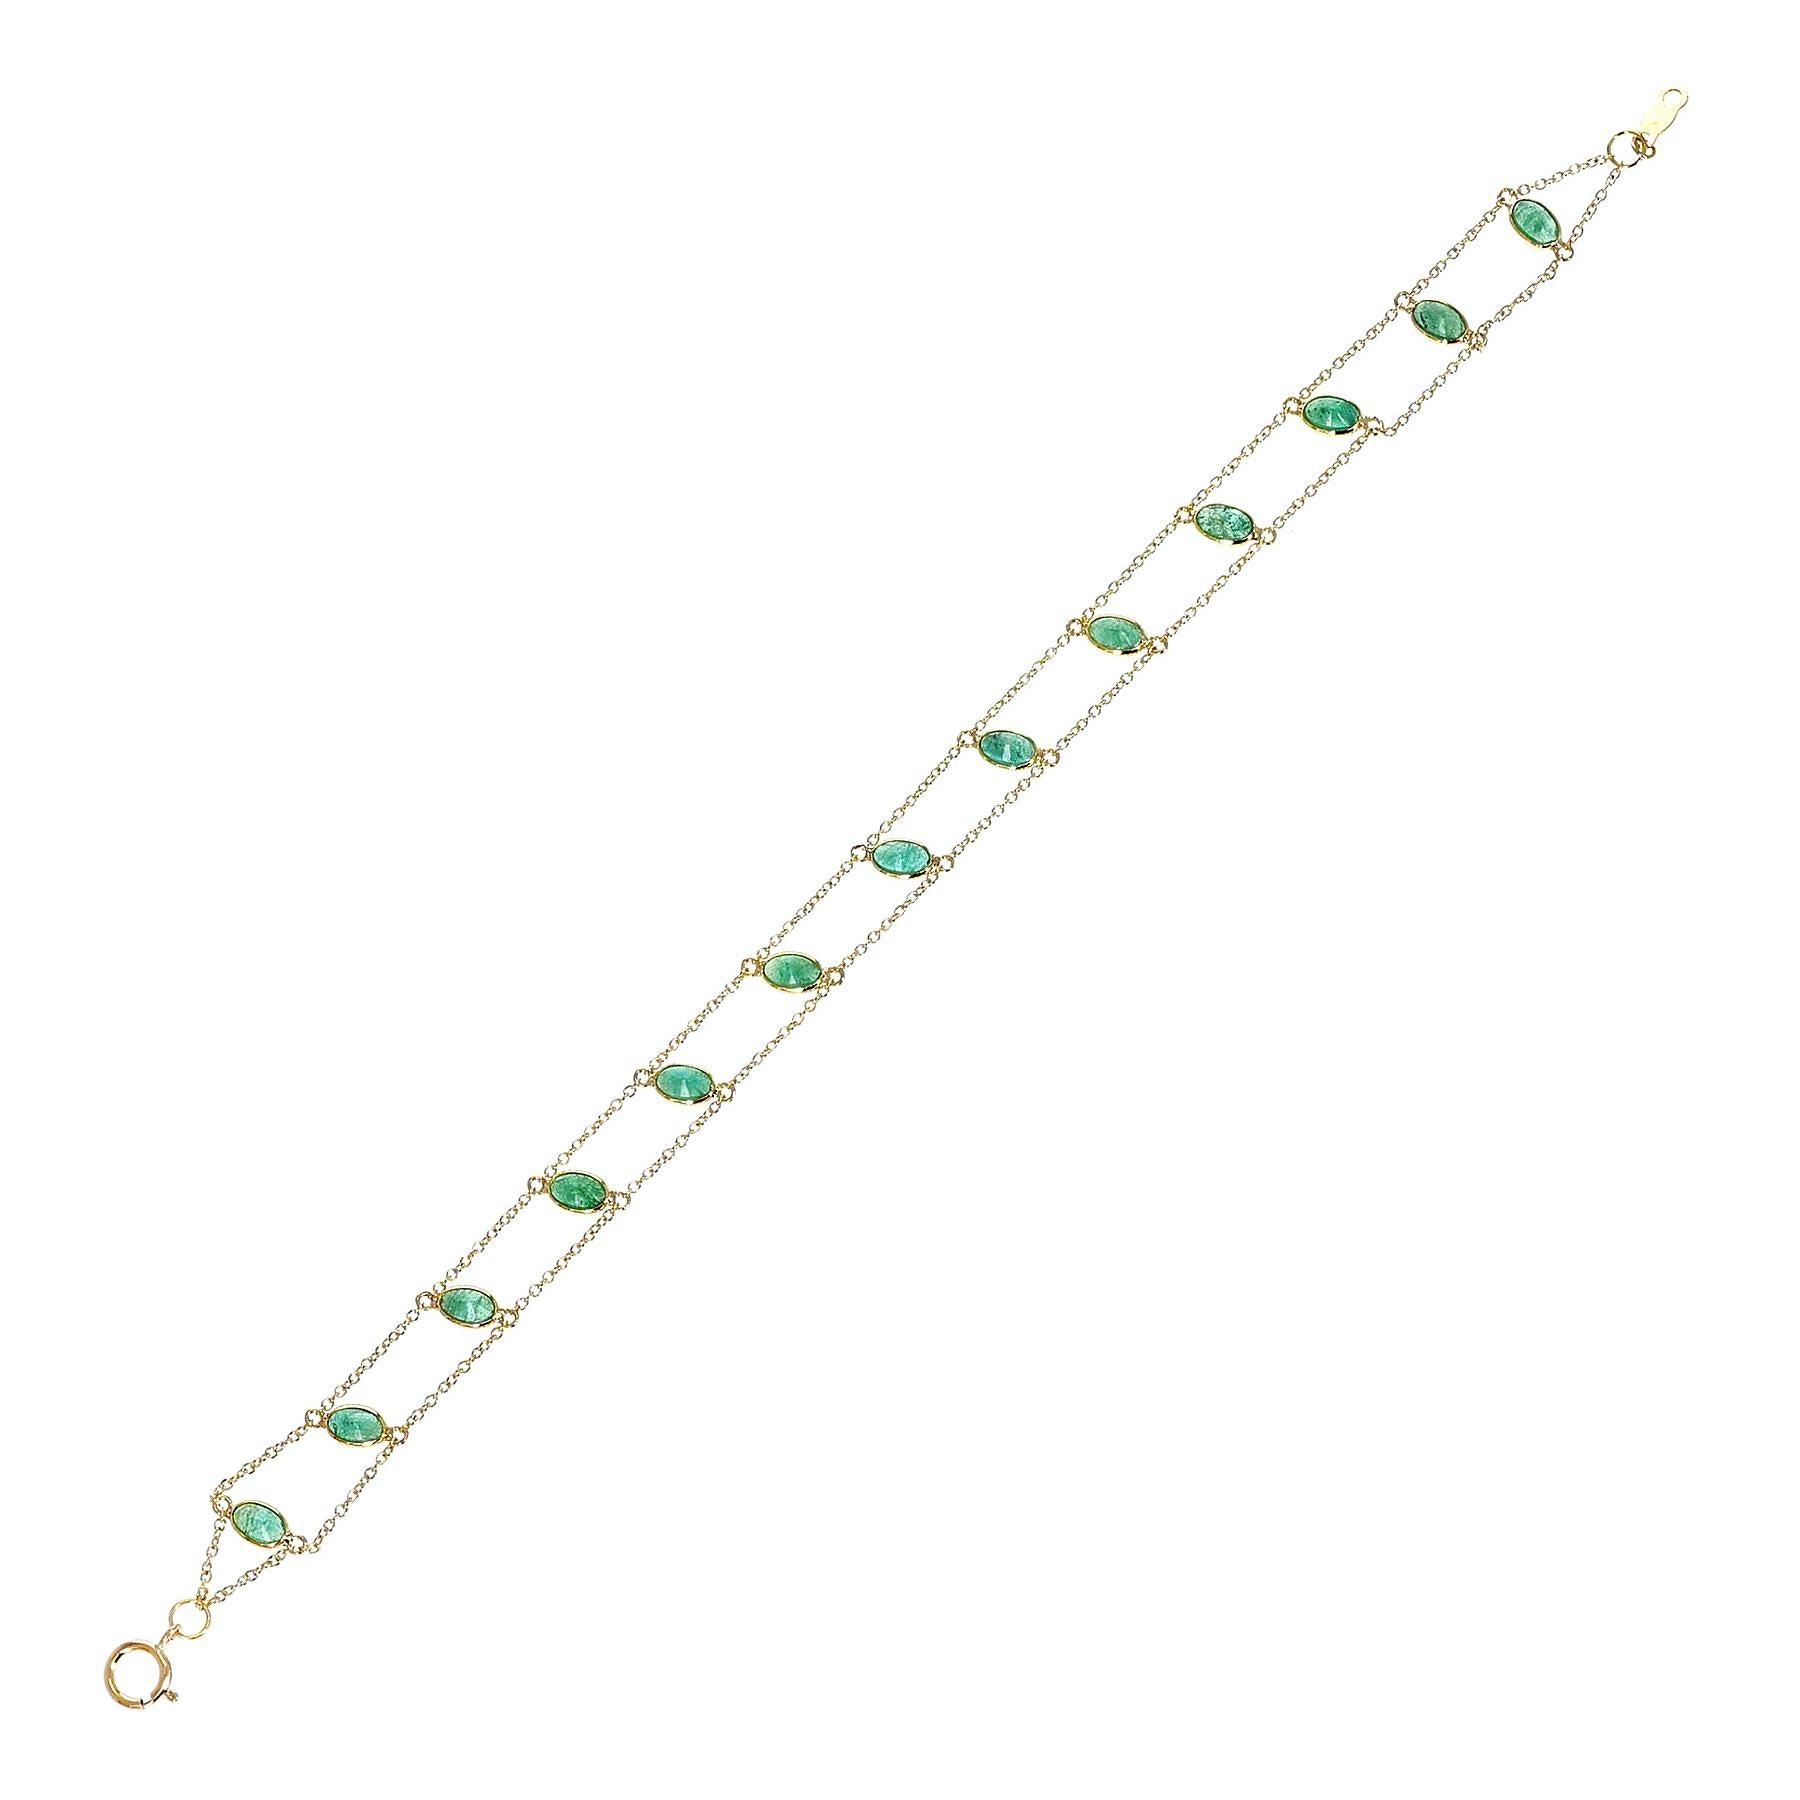 Oval Genuine Emerald 18k Yellow Gold Bracelet